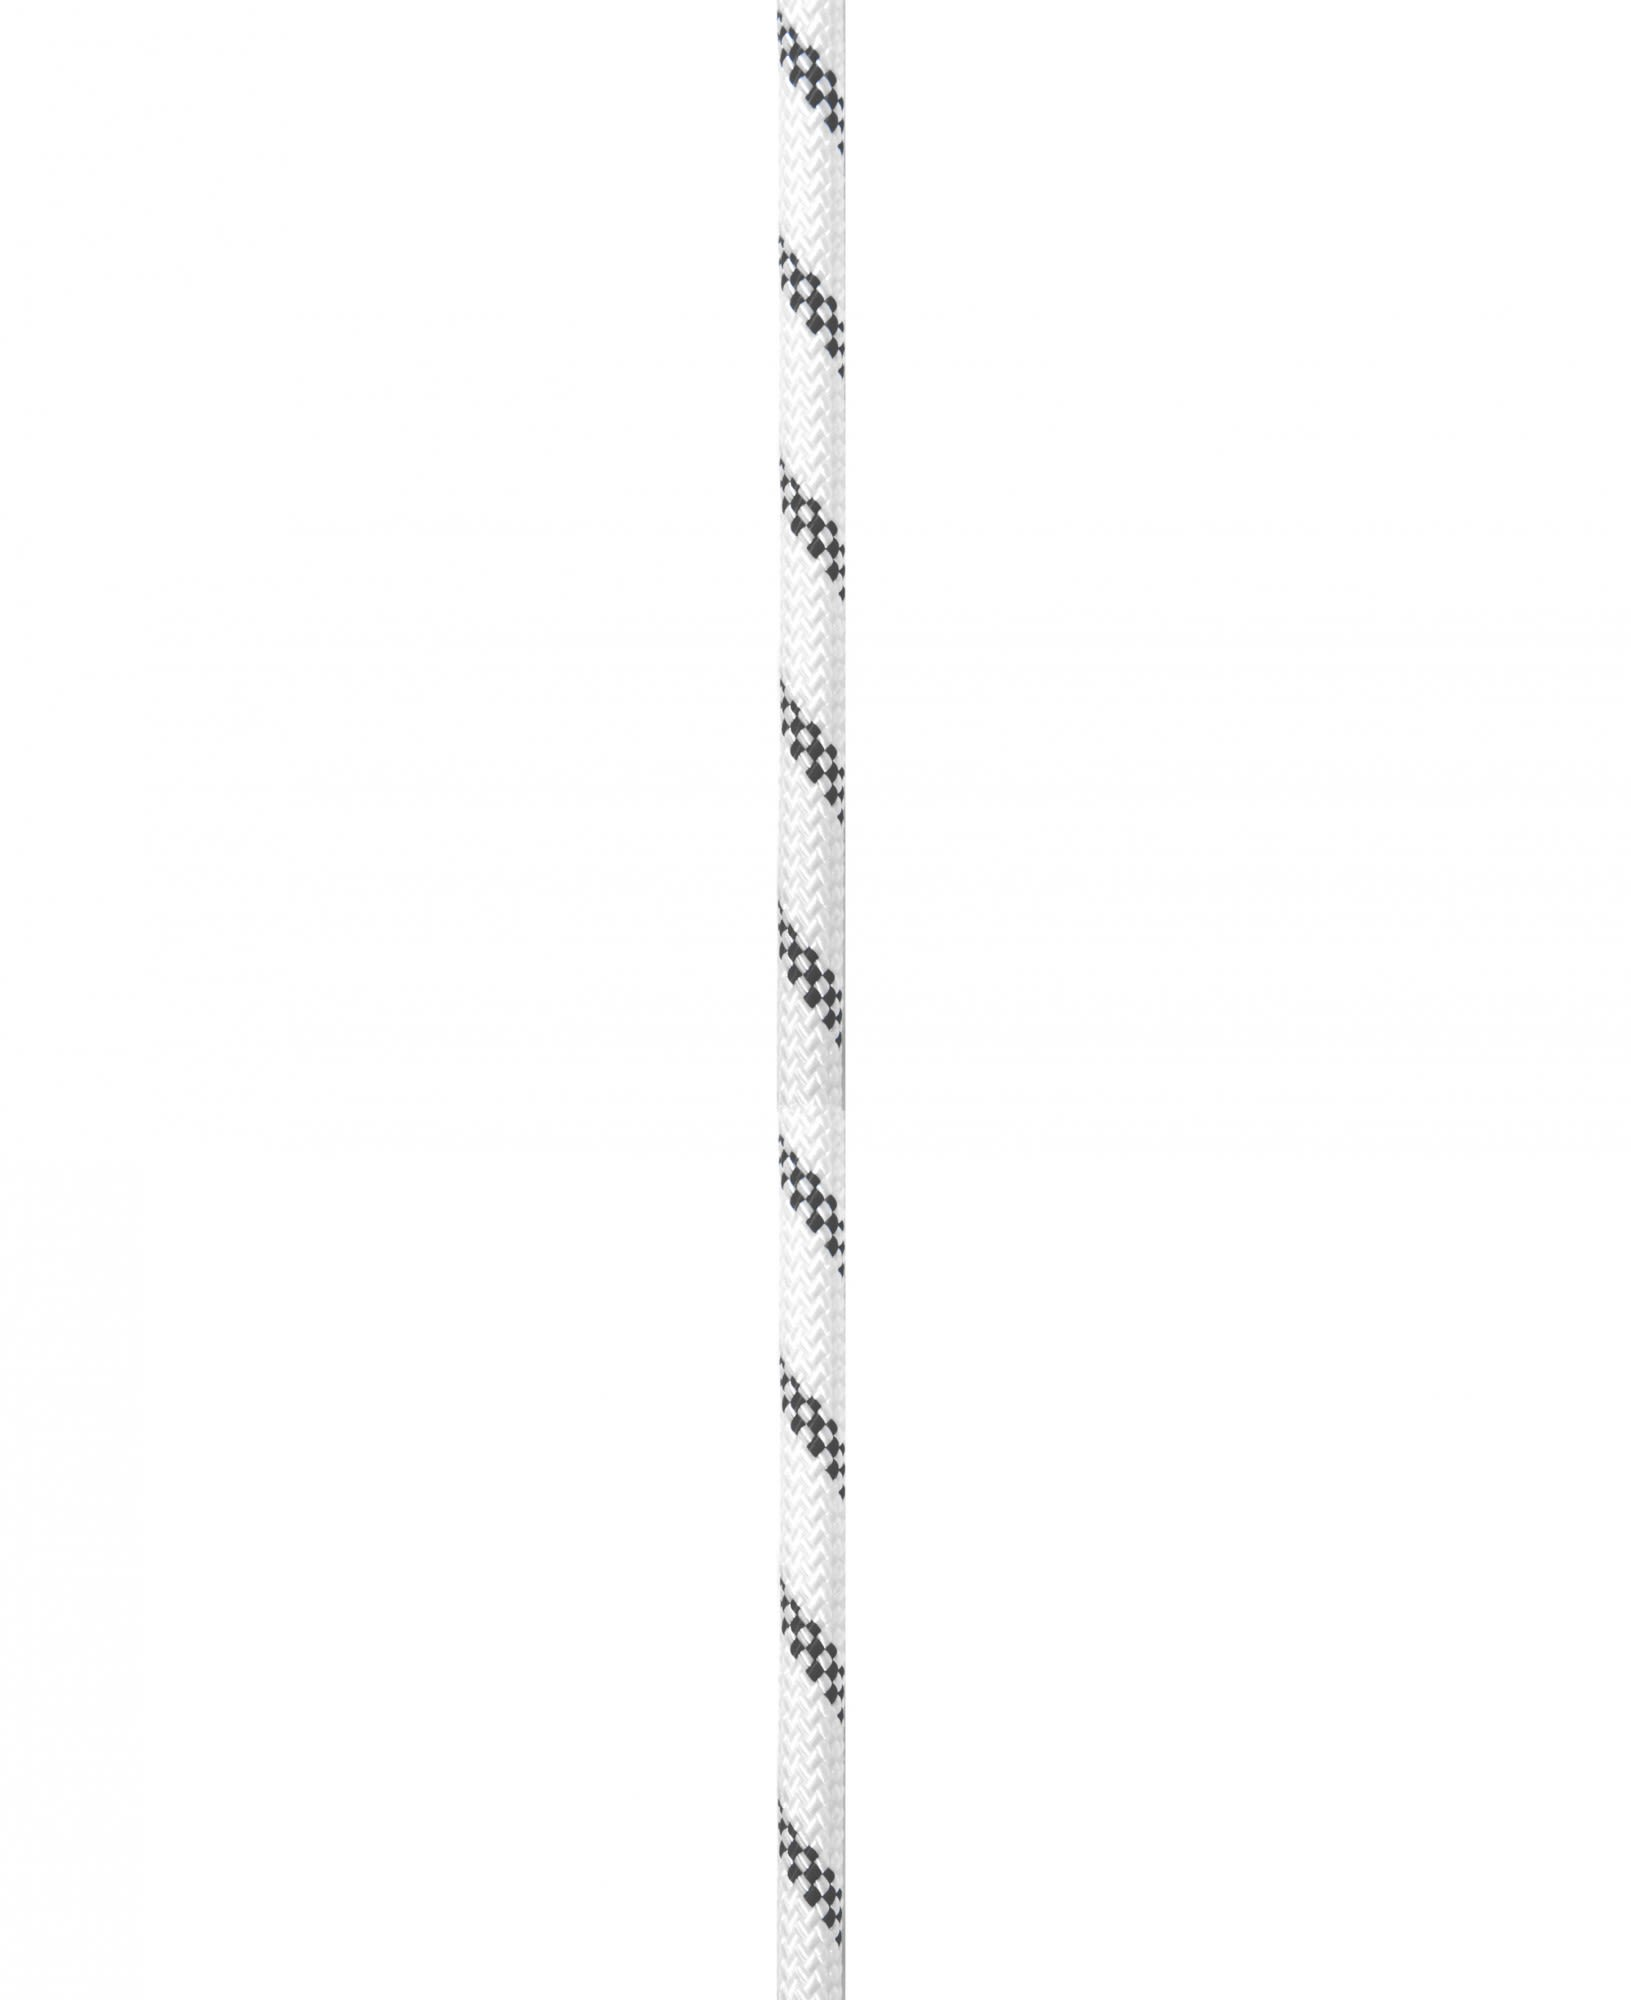 Edelrid Performance Static 10.5MM 50M | Größe 50 m |  Kletterseile